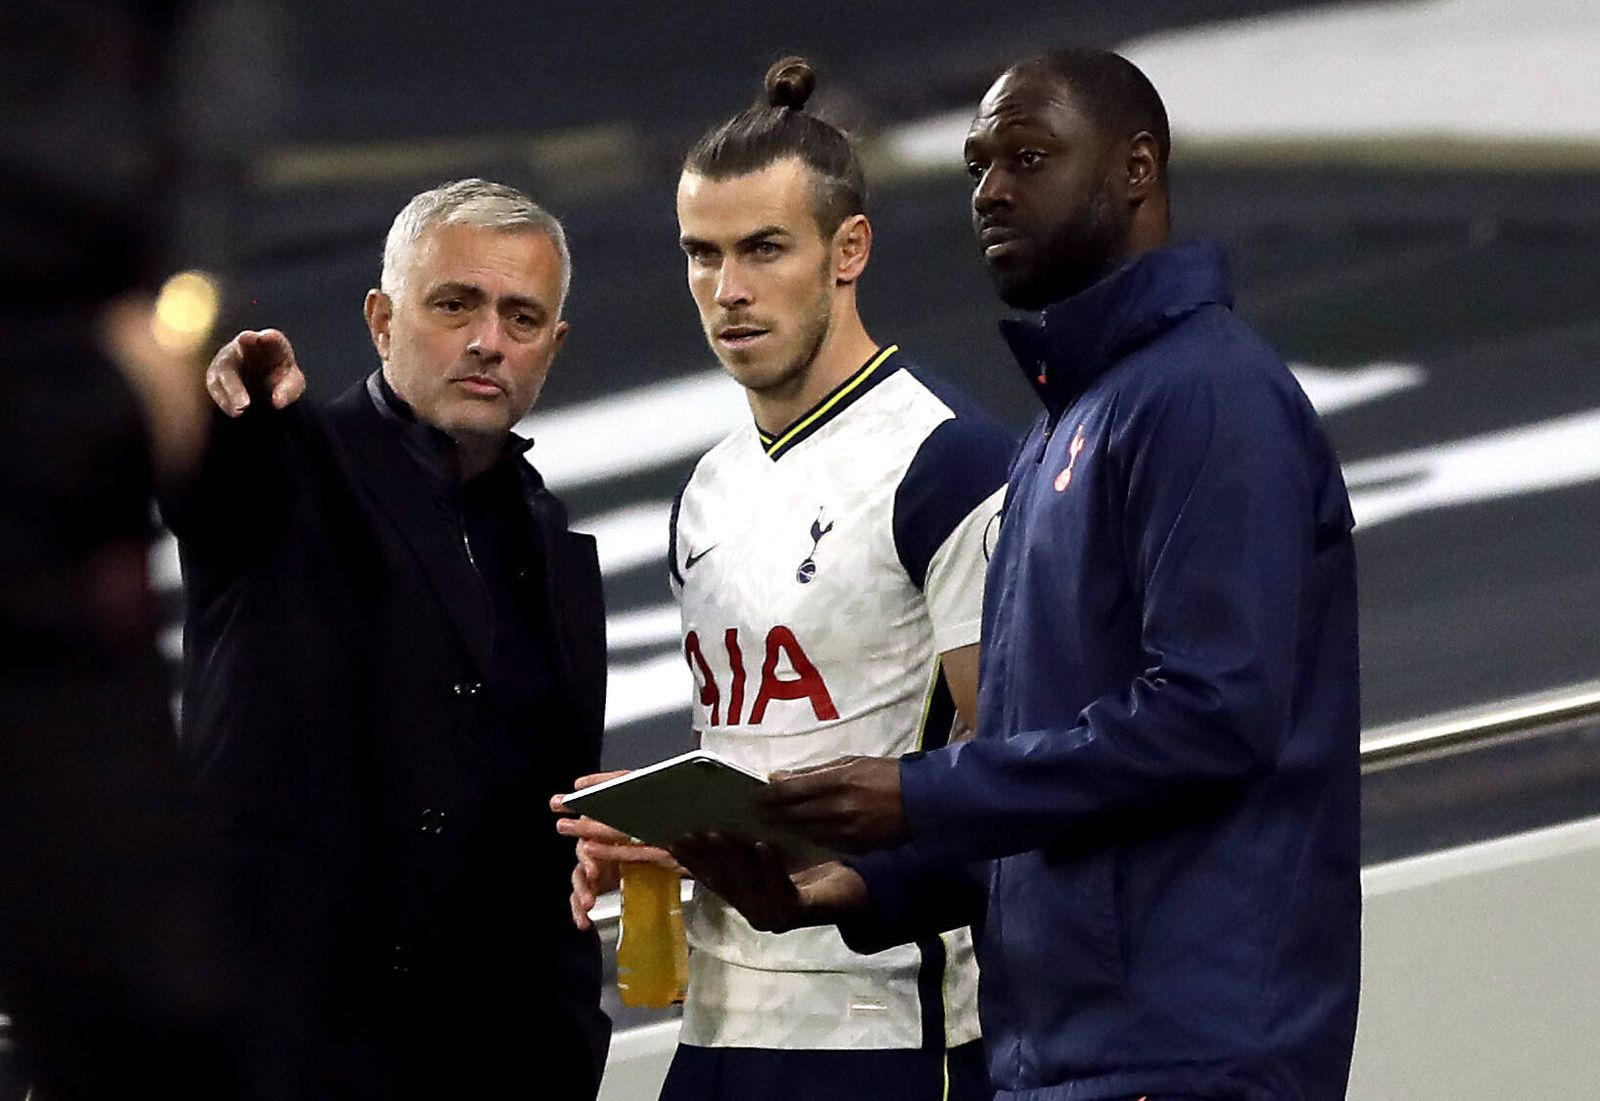 Tottenham Hotspur v West Ham United - Premier League - Tottenham Hotspur Stadium Tottenham Hotspur manager Jose Mourinh